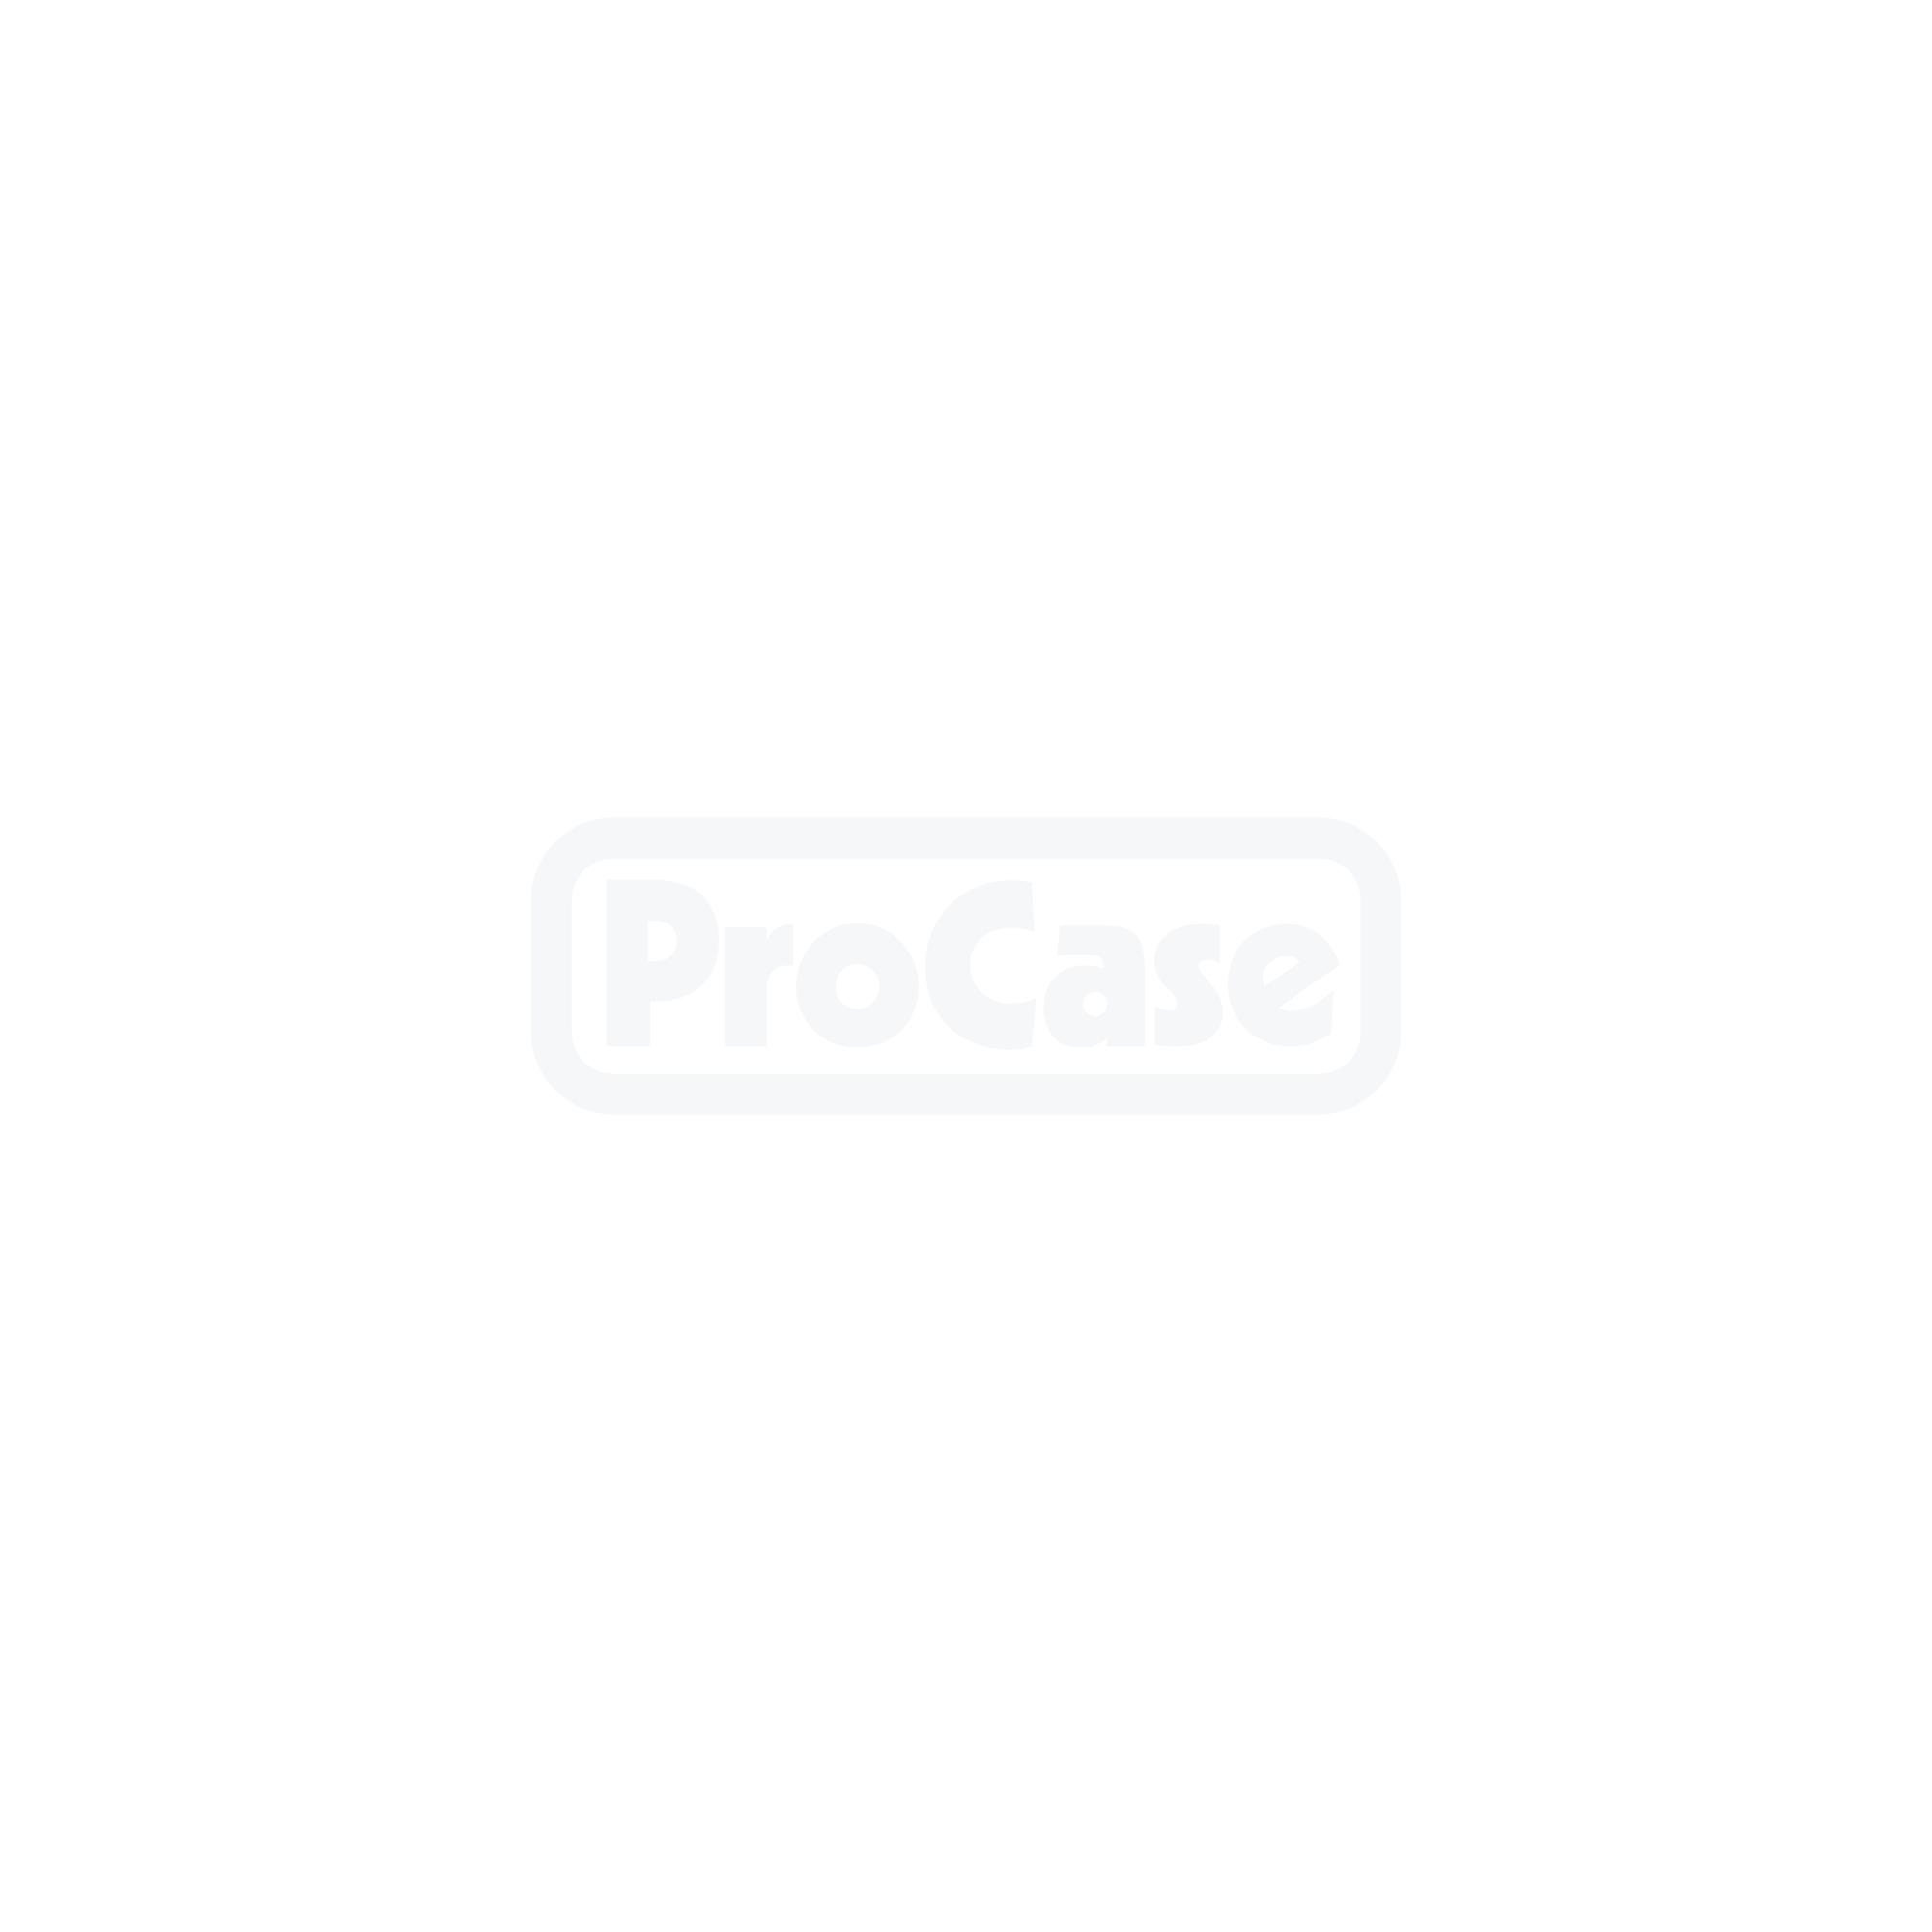 Flightcase für 4 ShowTec Helix S5000 Q4 2